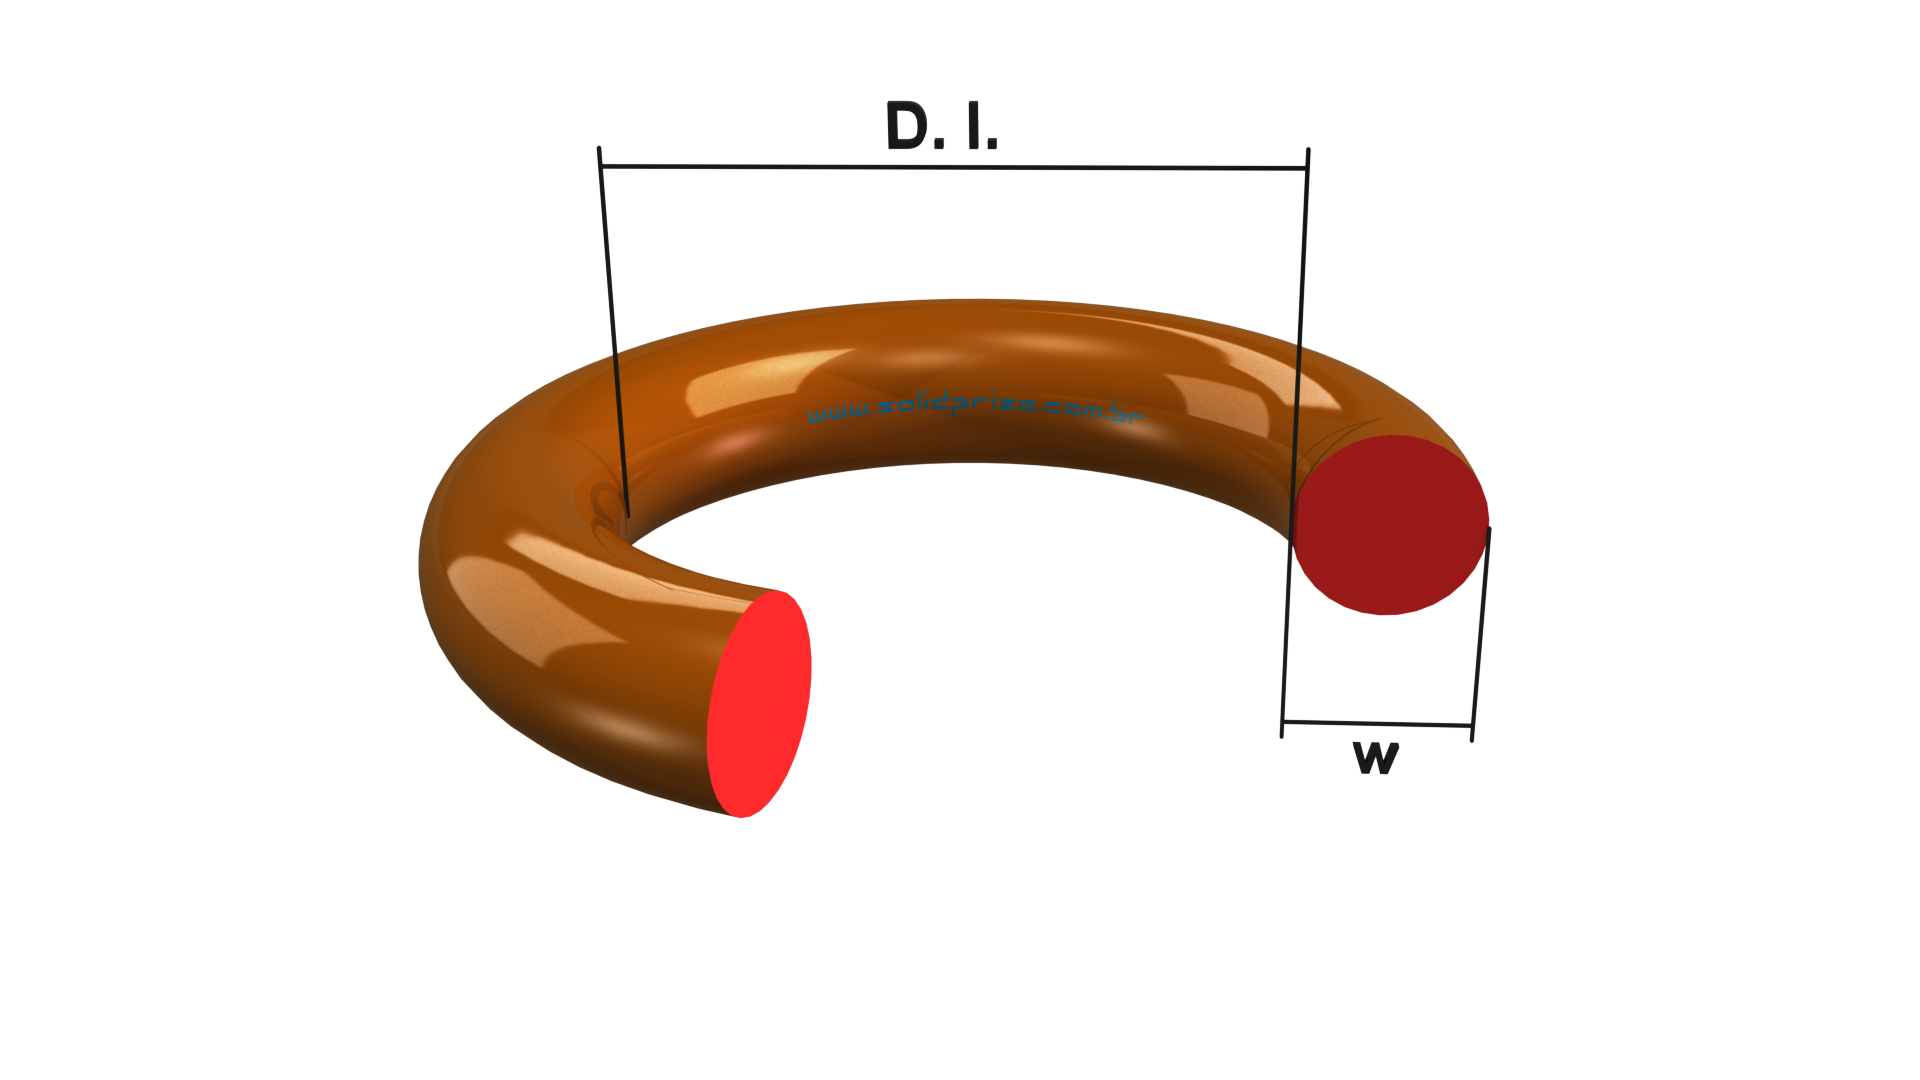 10 Stück O-Ring O-Ringe 27 x 3 mm DIN 3601 Viton FPM FKM 75 Neu